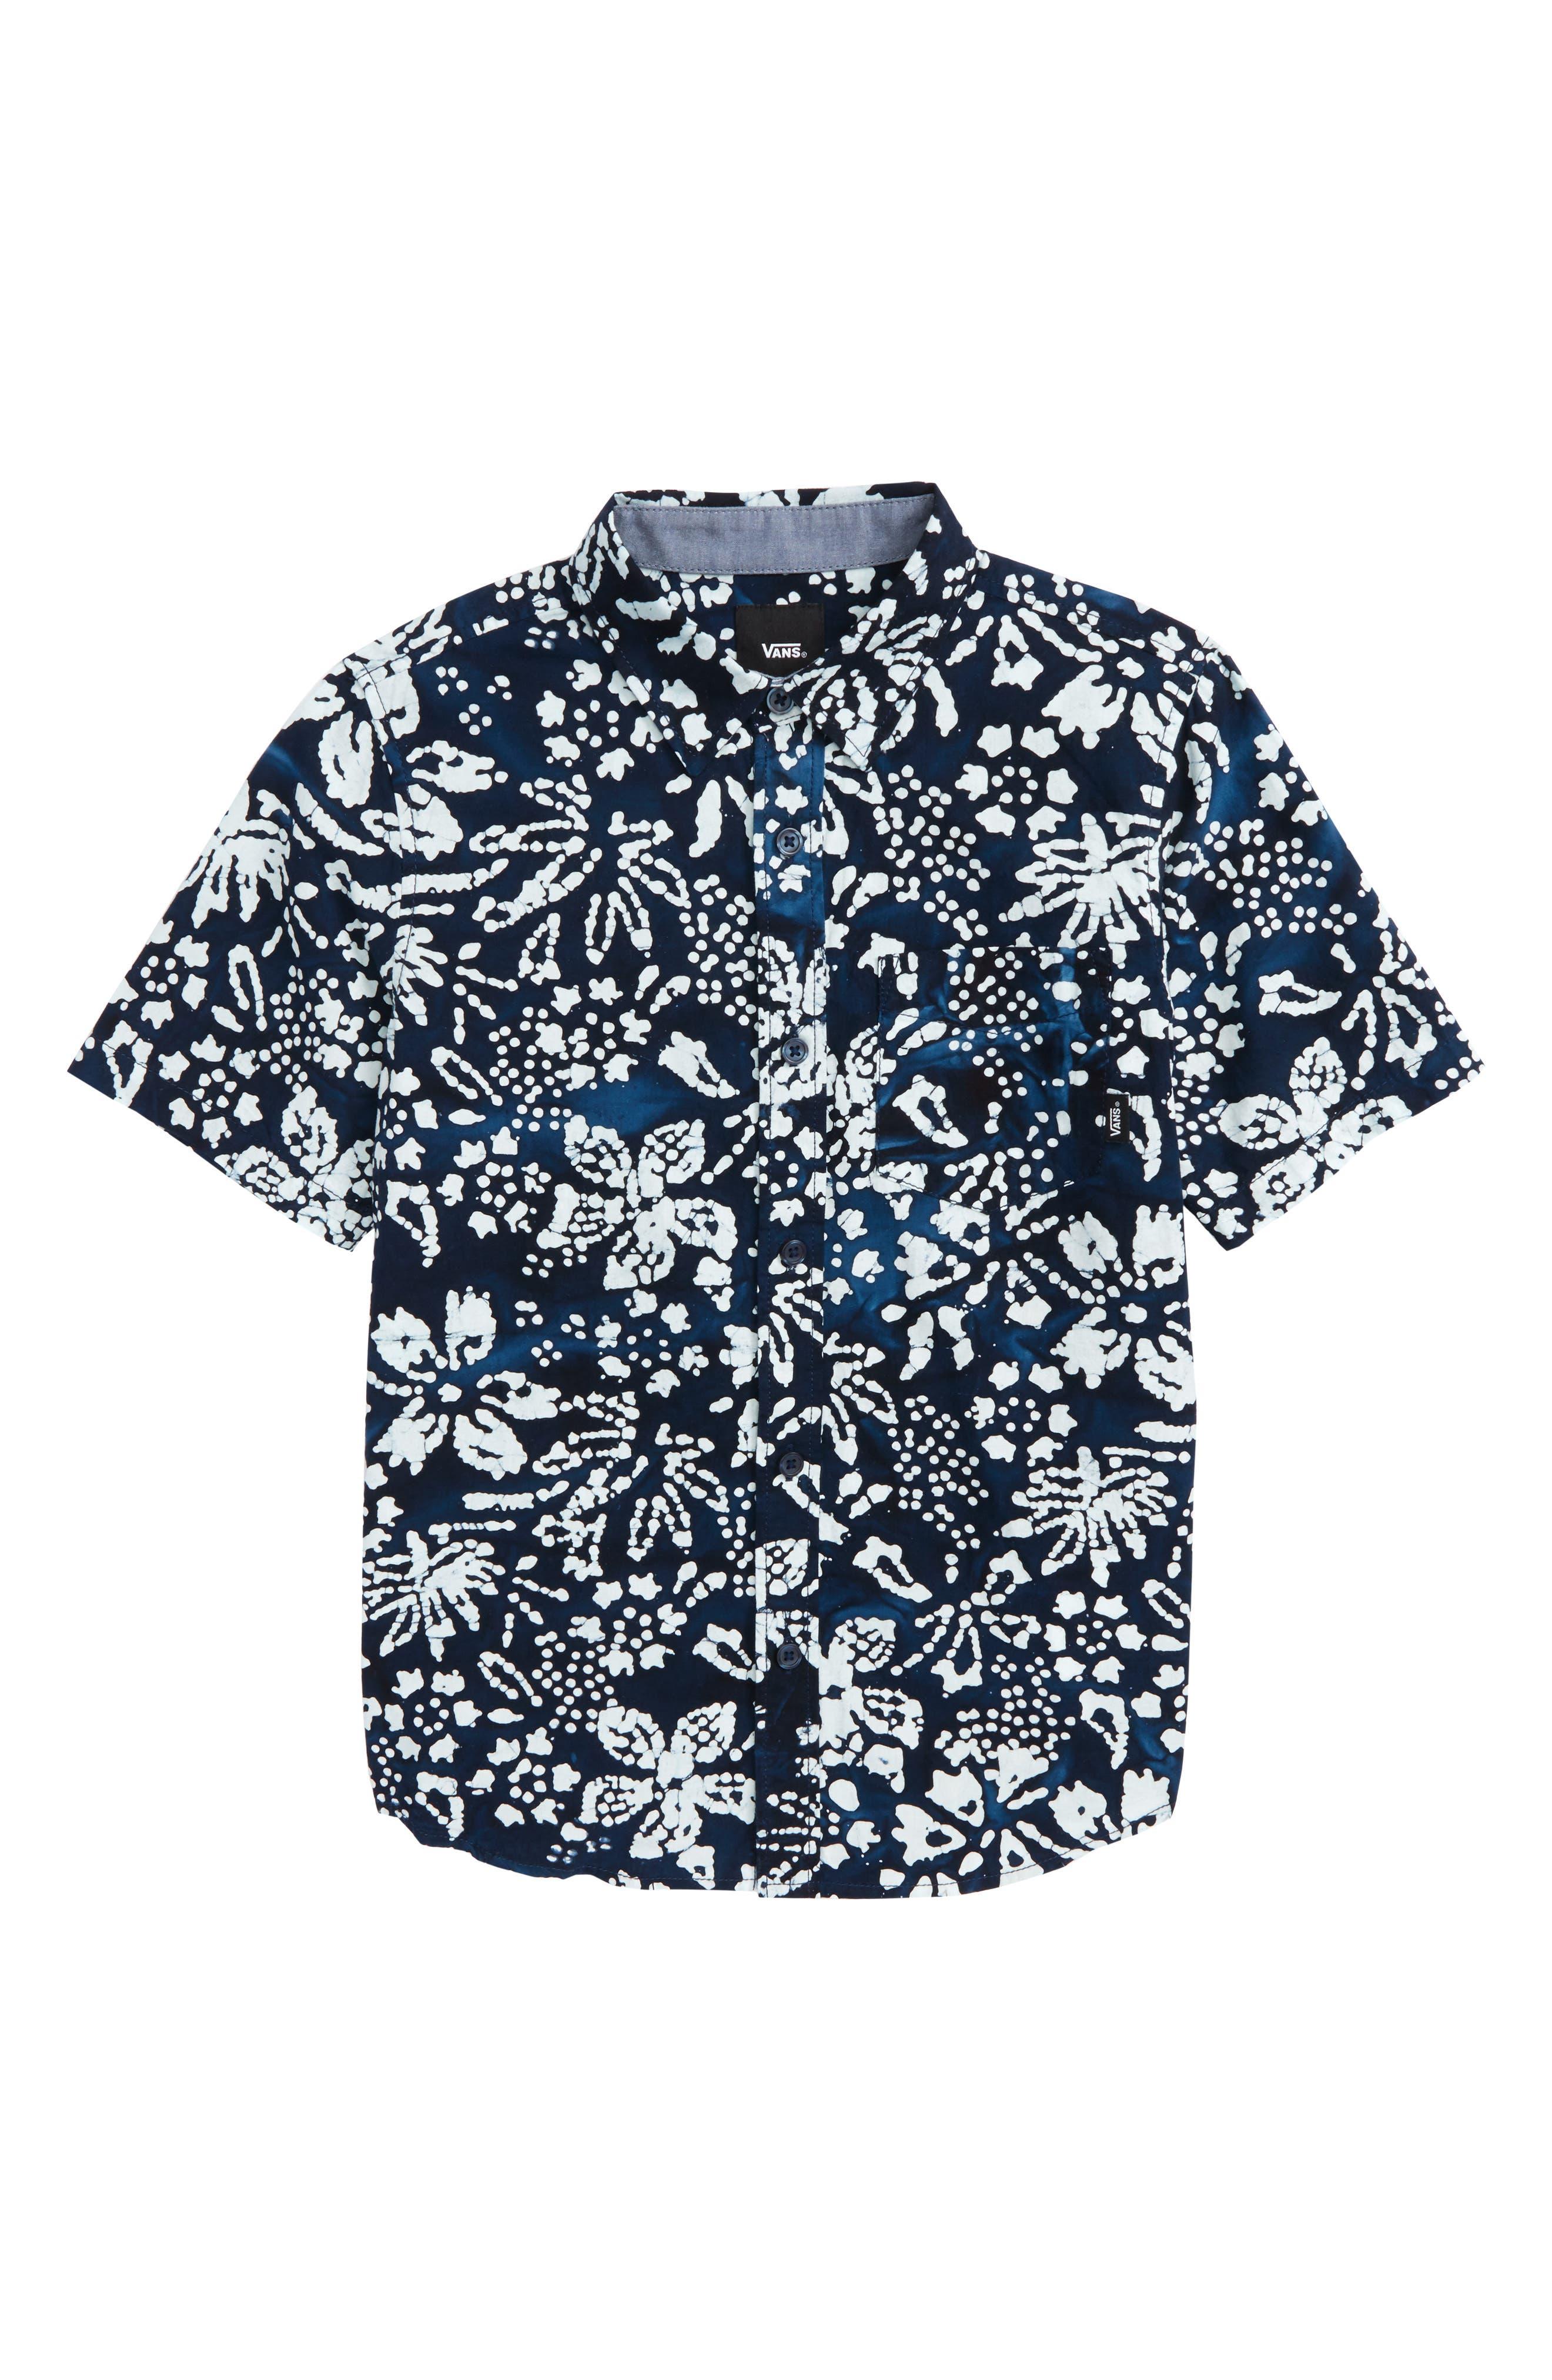 Vans Trippin Batik Print Woven Shirt (Big Boys)